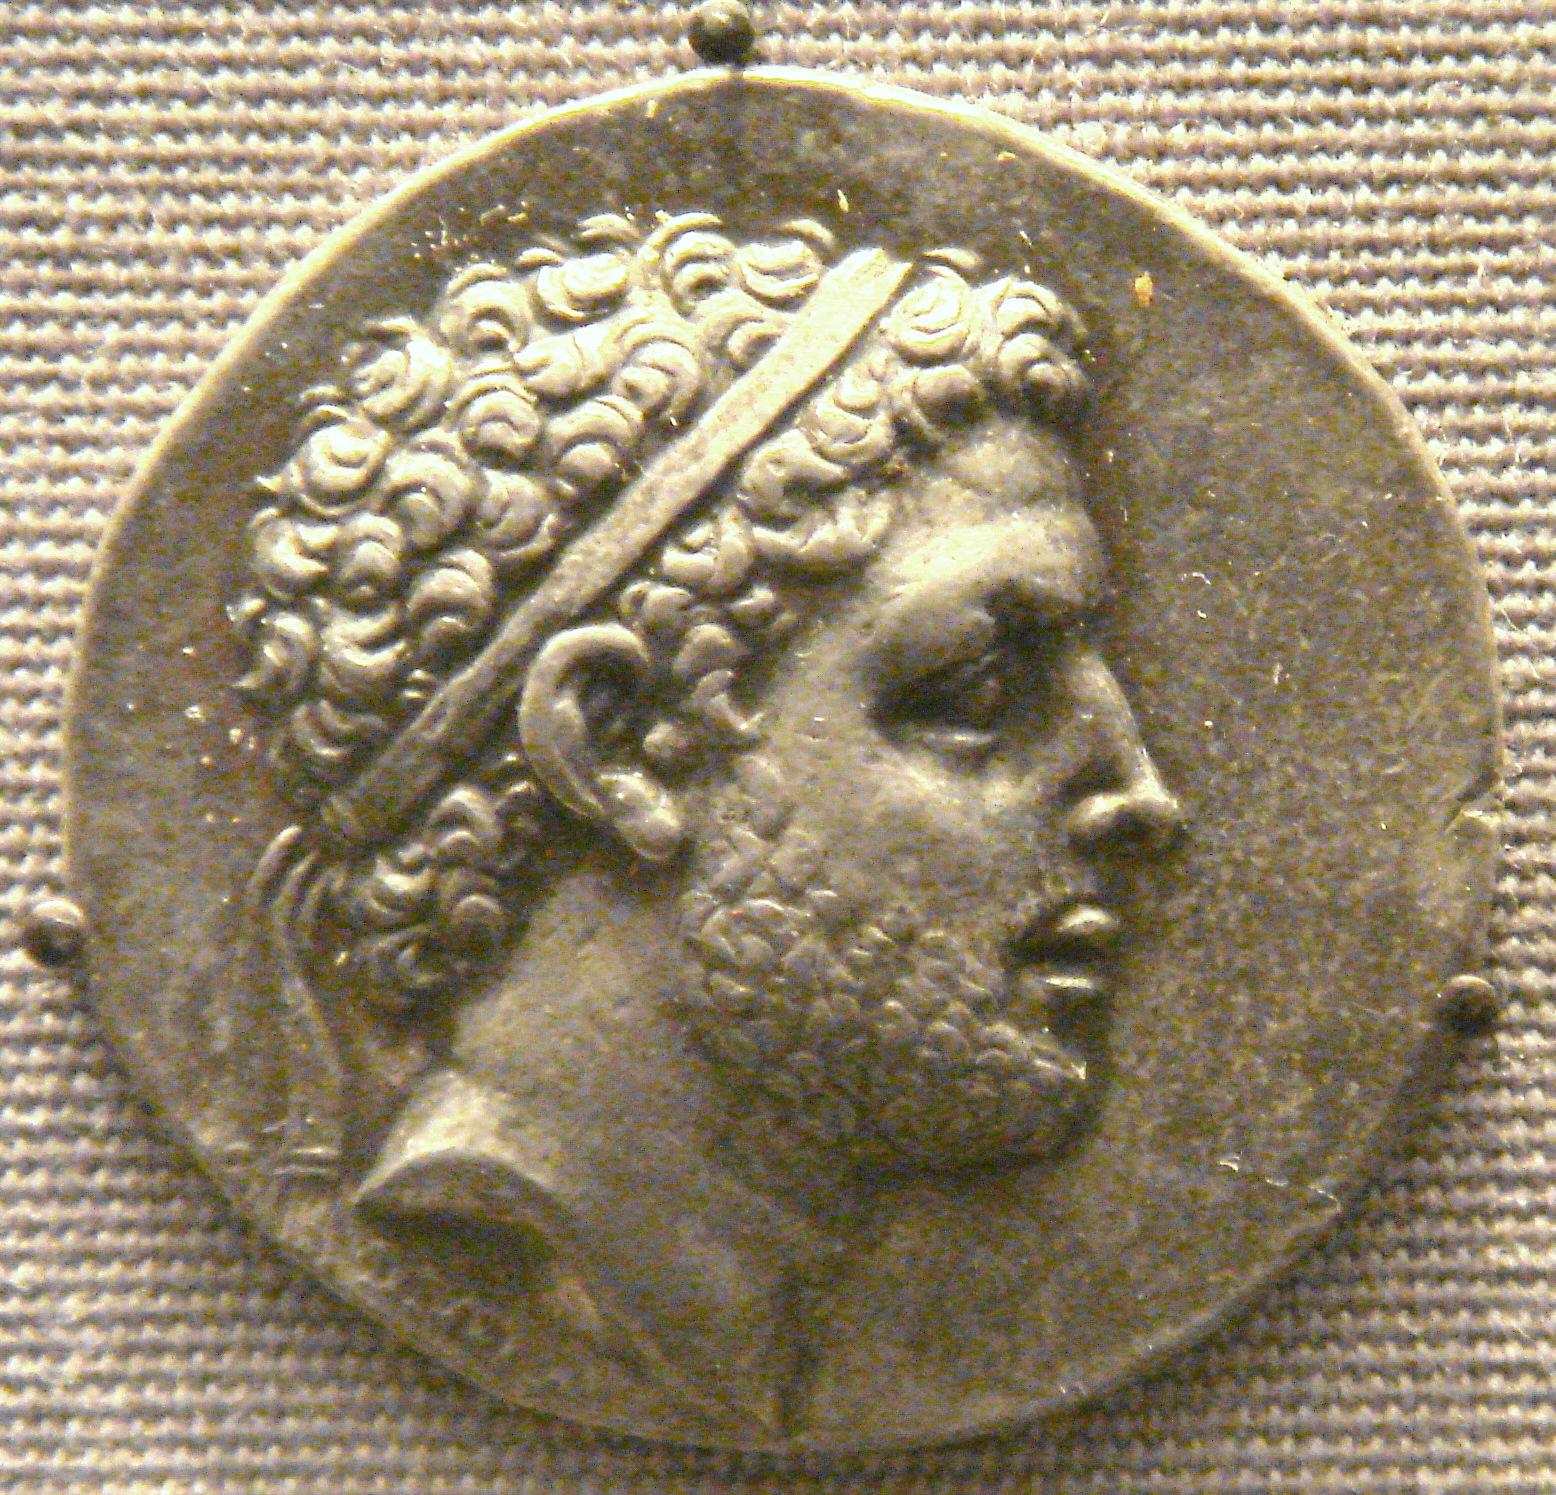 http://upload.wikimedia.org/wikipedia/commons/e/e2/Perseus_of_Macedon_BM.jpg